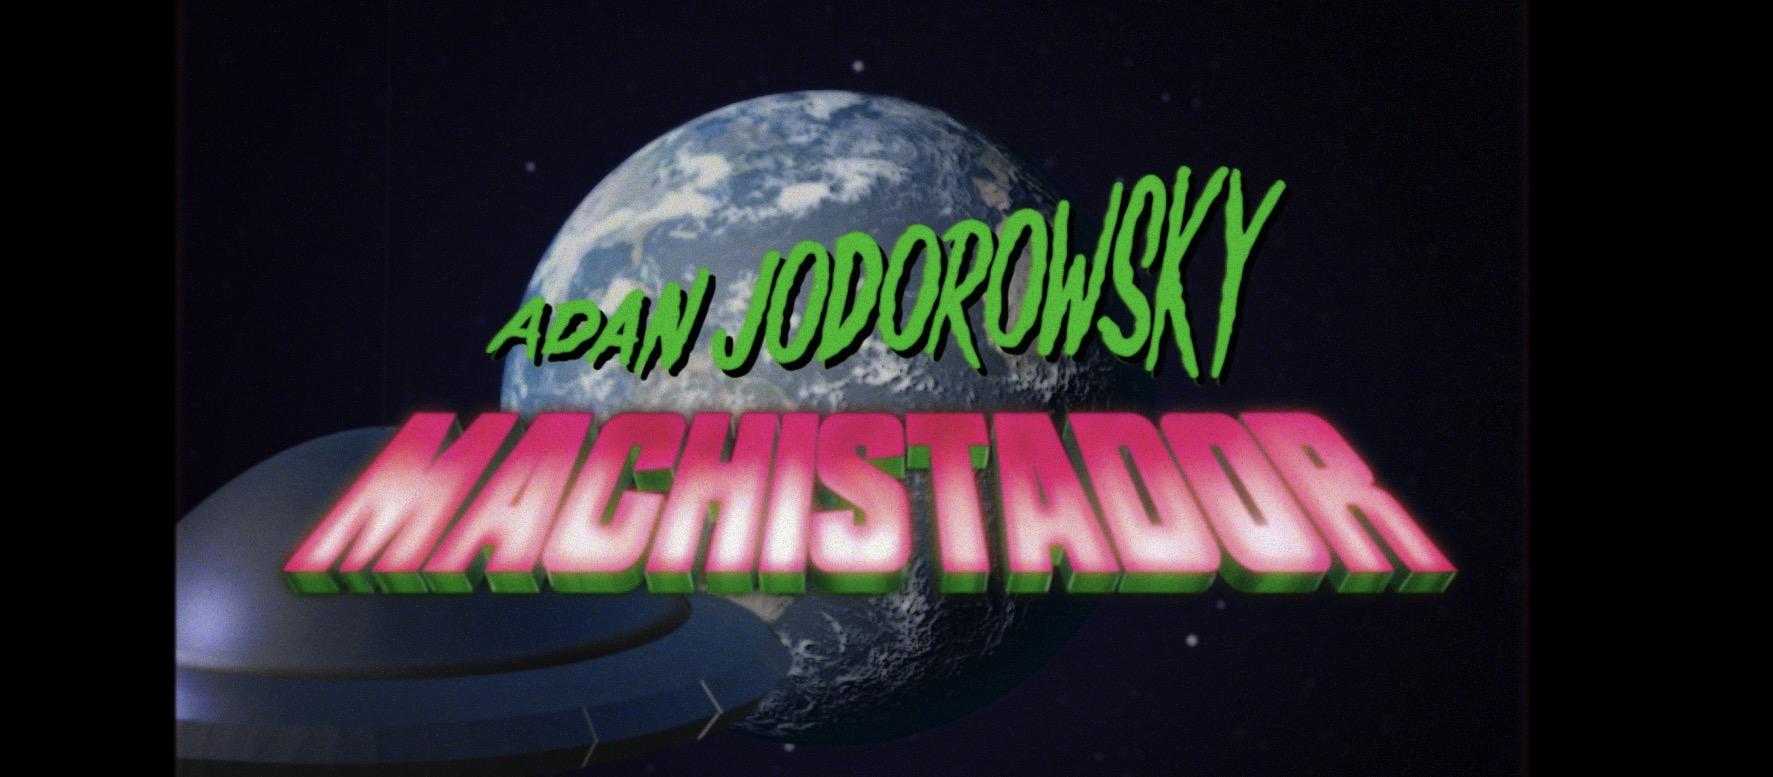 Adán Jodorosky - Machistador